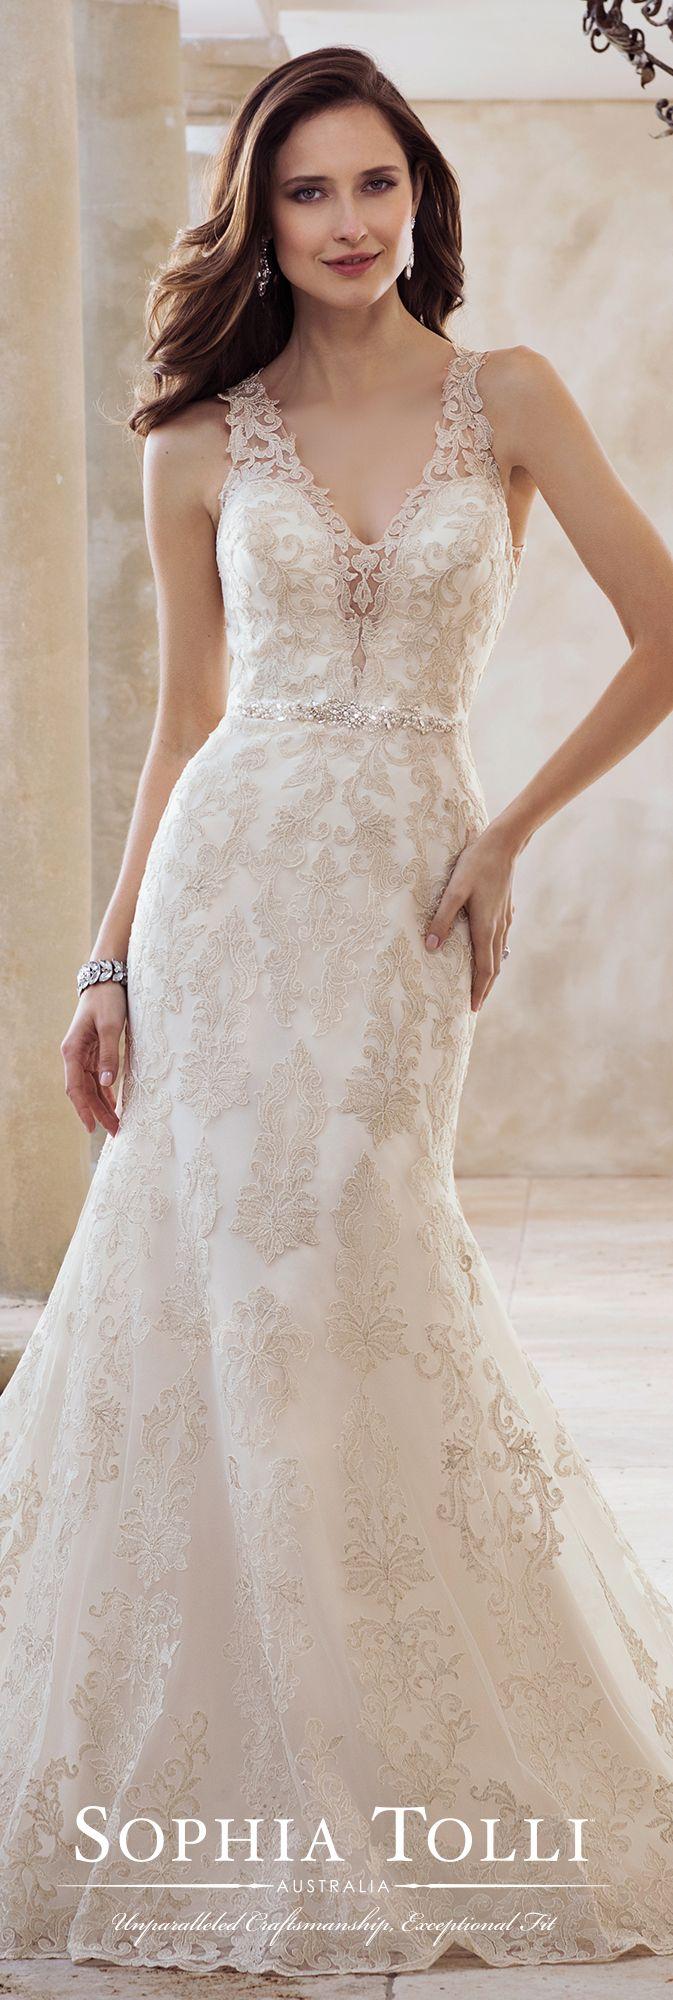 5df2fbda1086 2-Piece Beaded Lace Fit   Flare Wedding Dress - Y11883 Olympia ...